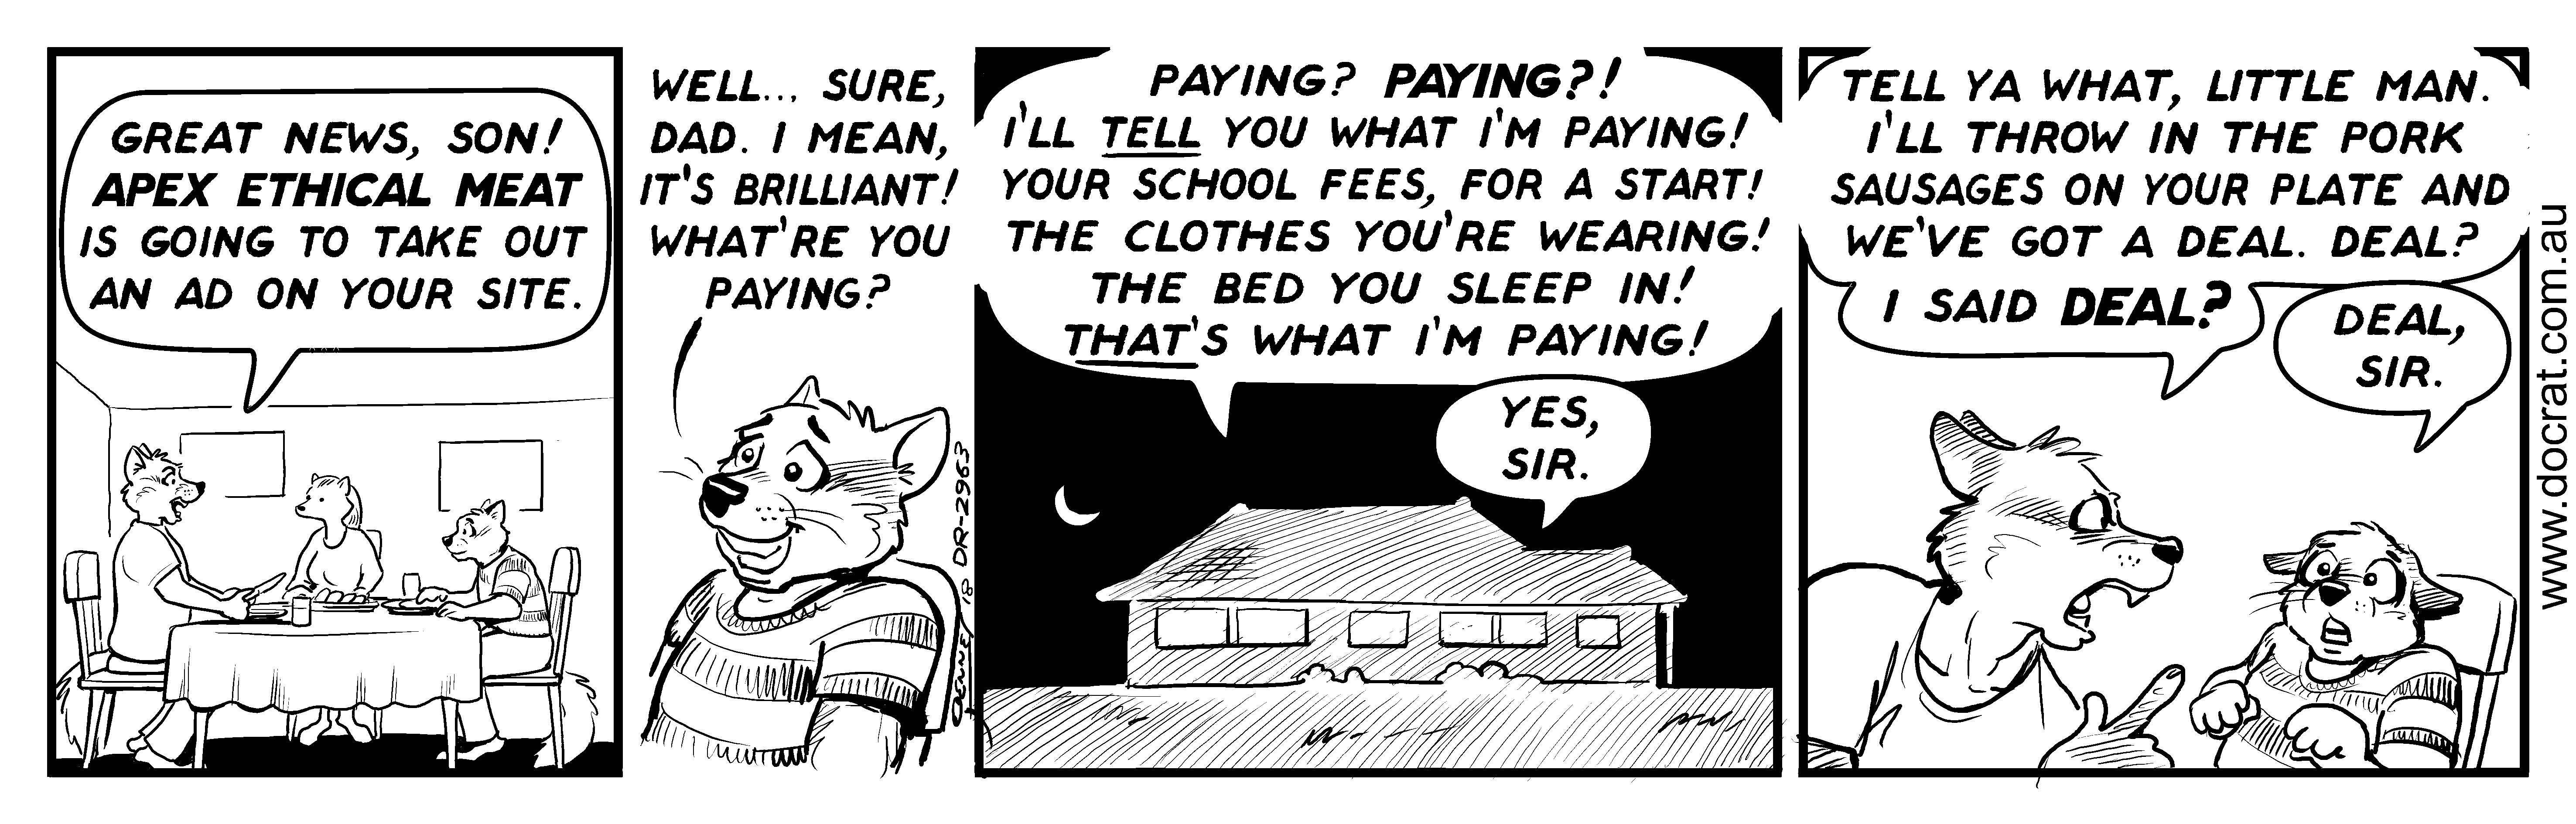 20180131